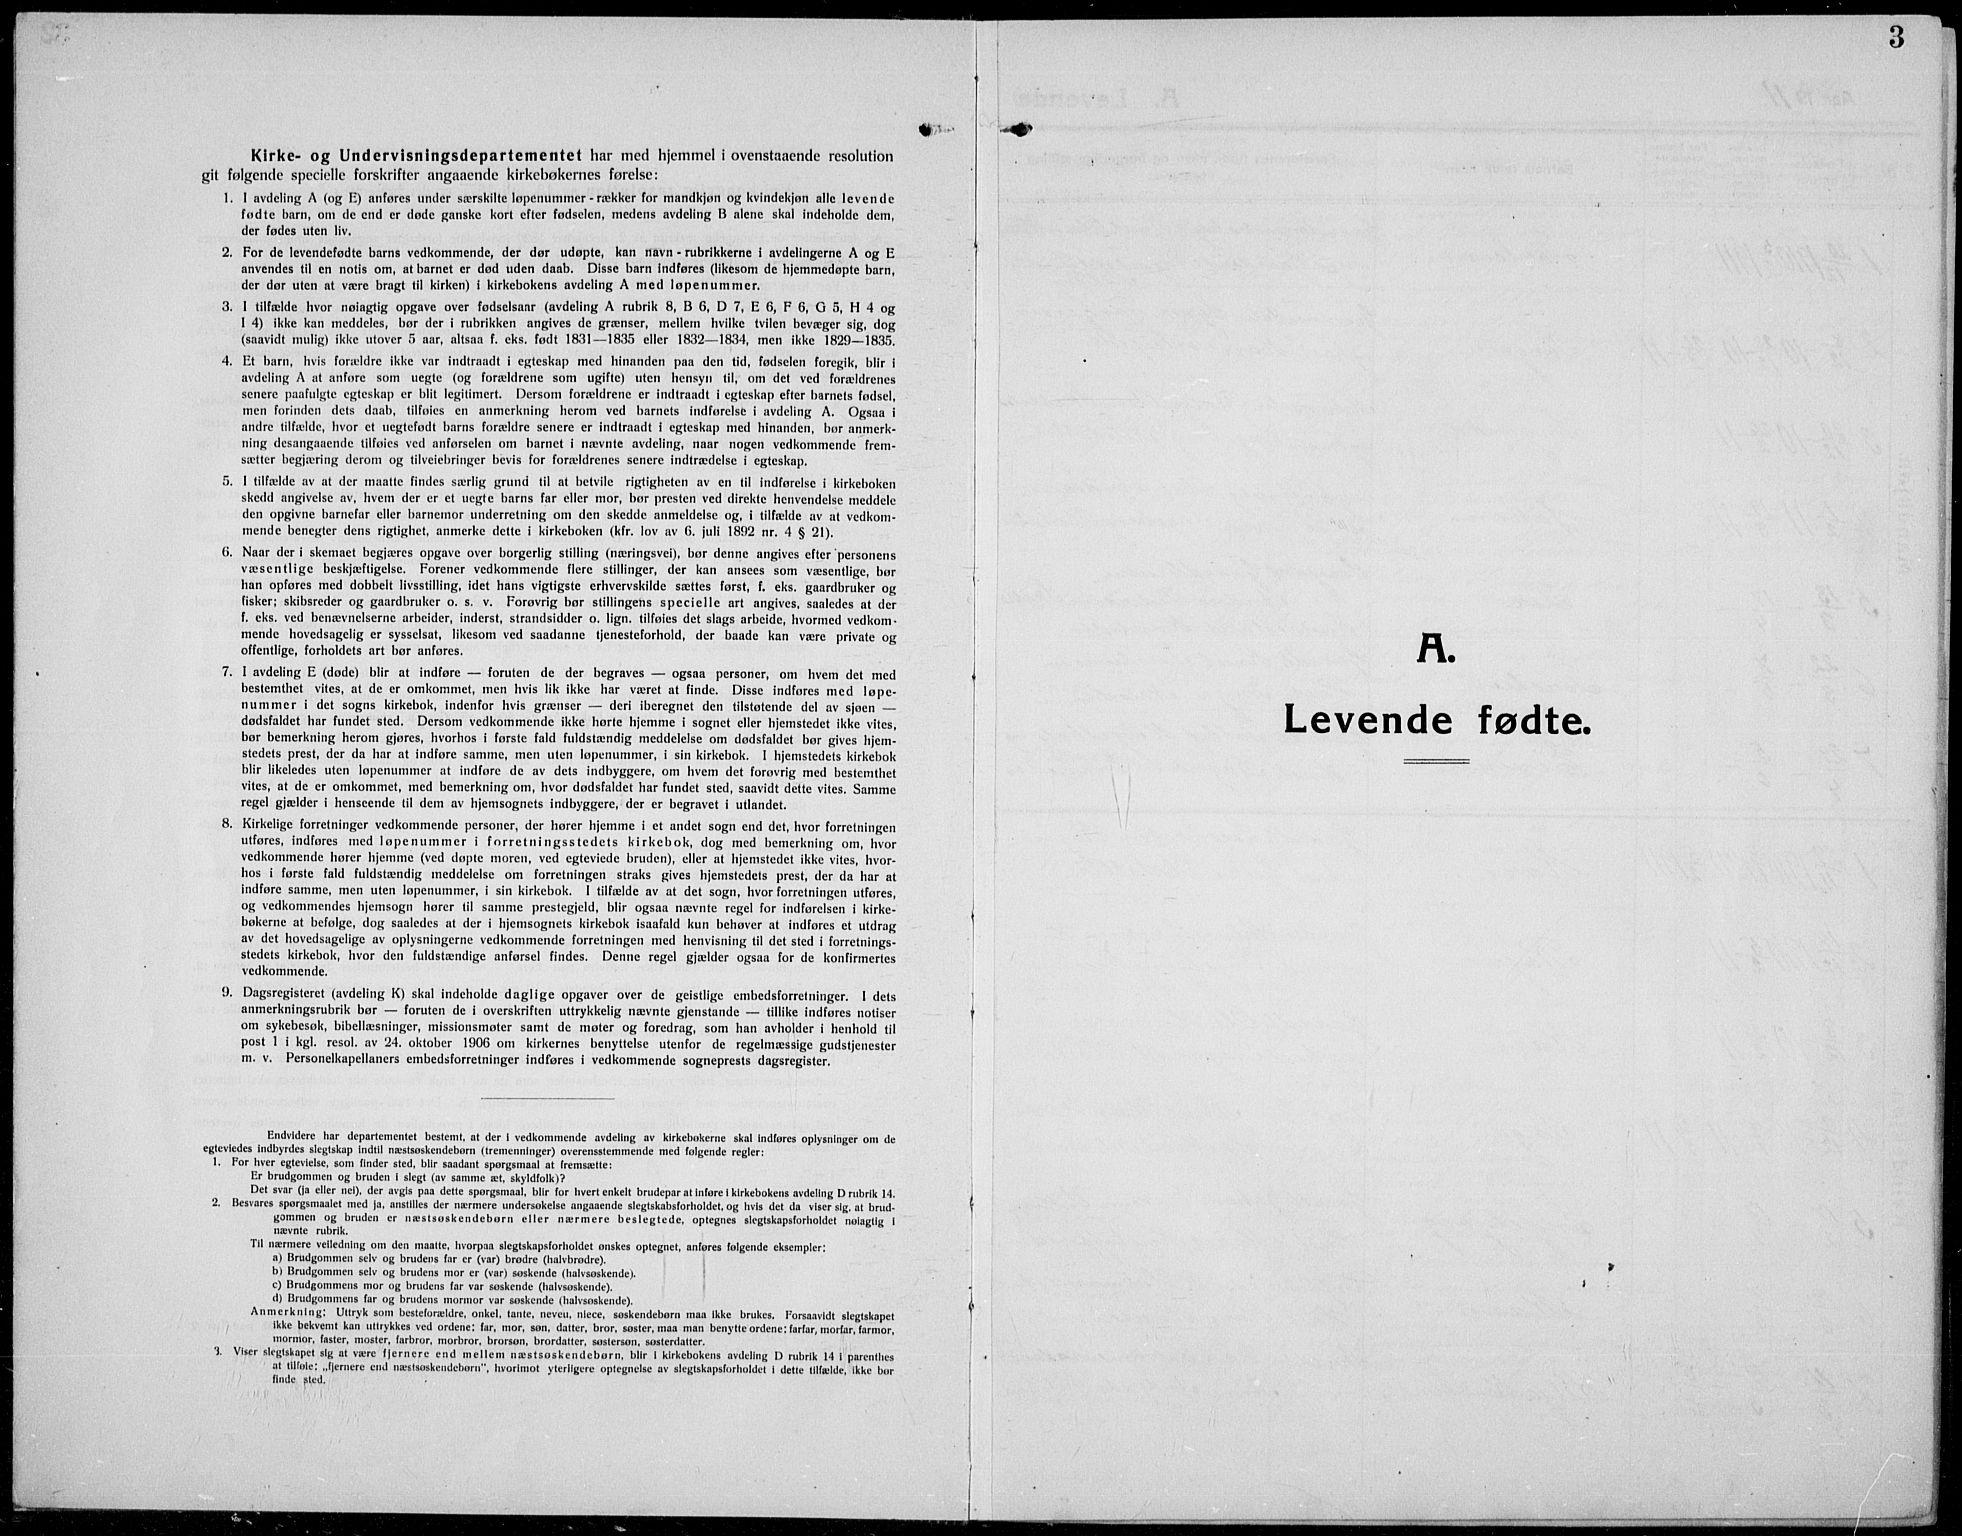 SAH, Øystre Slidre prestekontor, Klokkerbok nr. 8, 1911-1938, s. 3